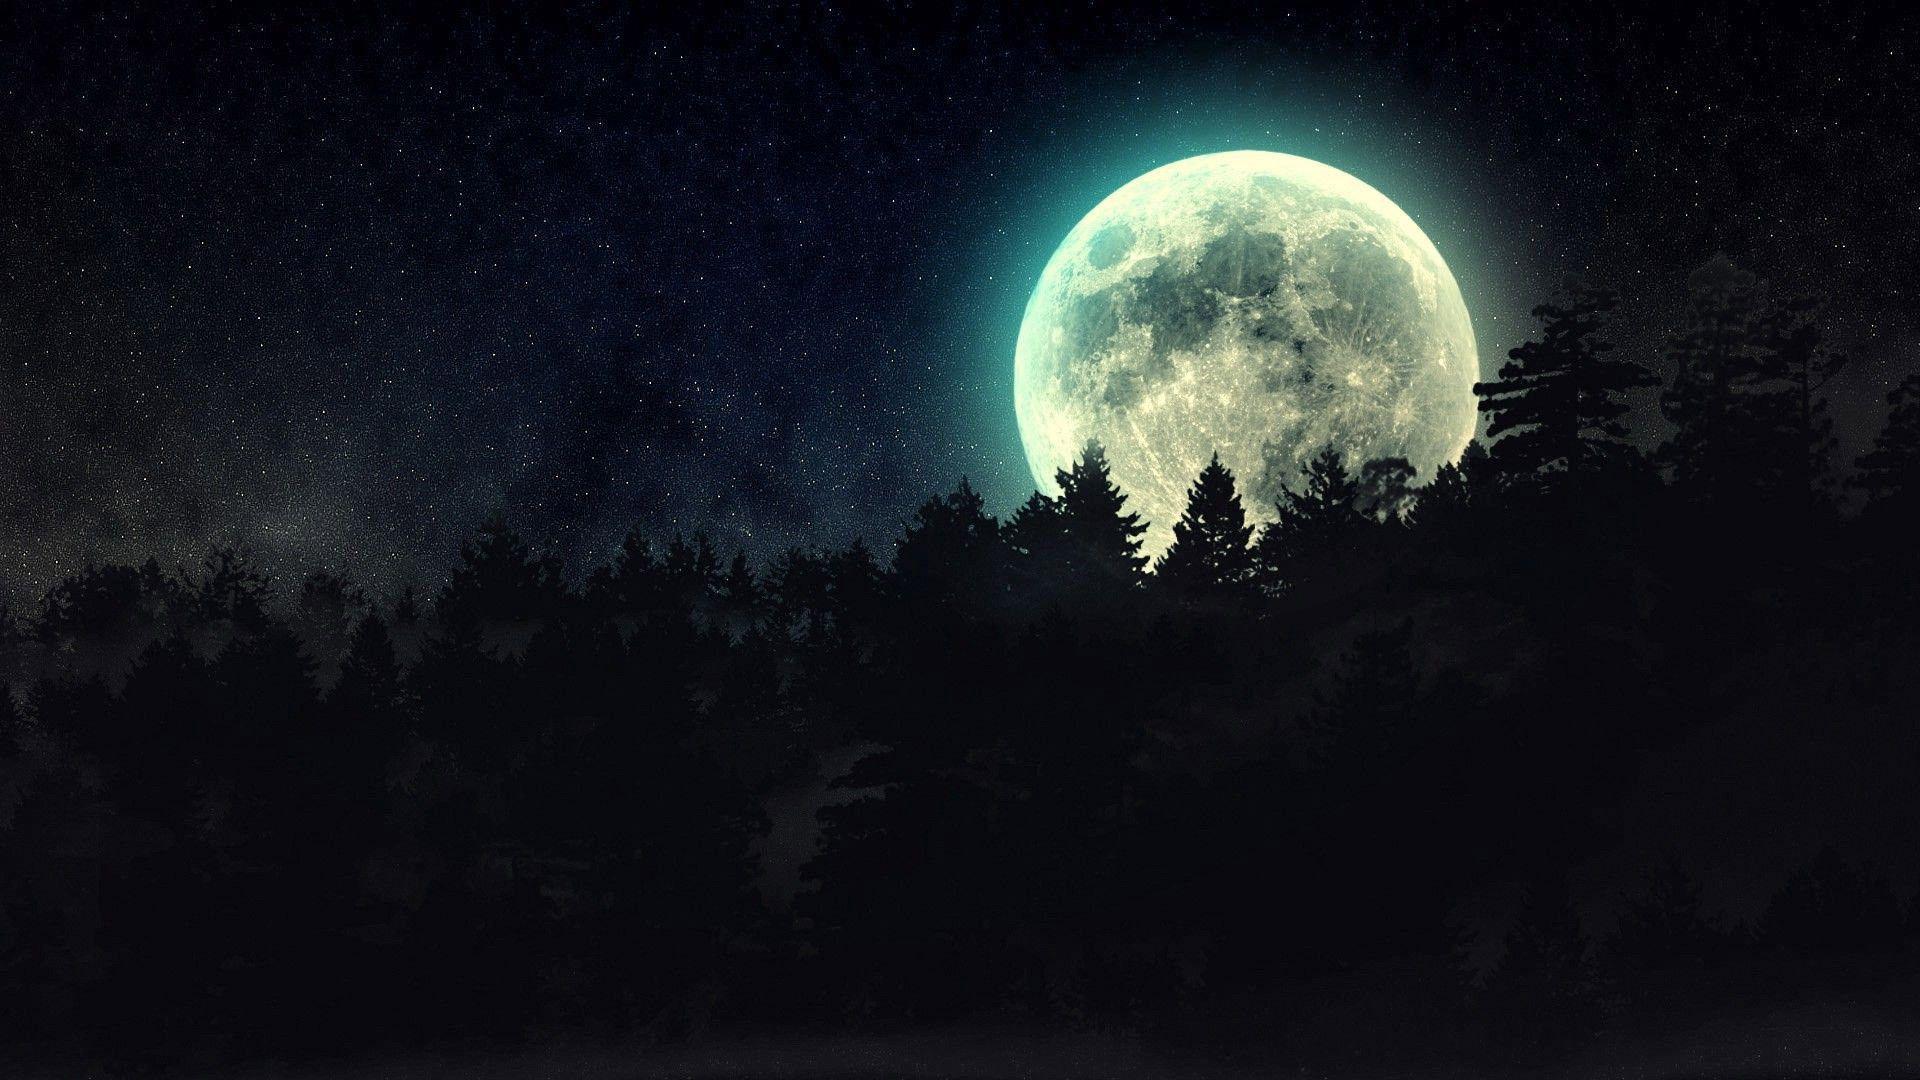 Full Moon Wallpapers HD Best Wallpaper HD Wallpaper